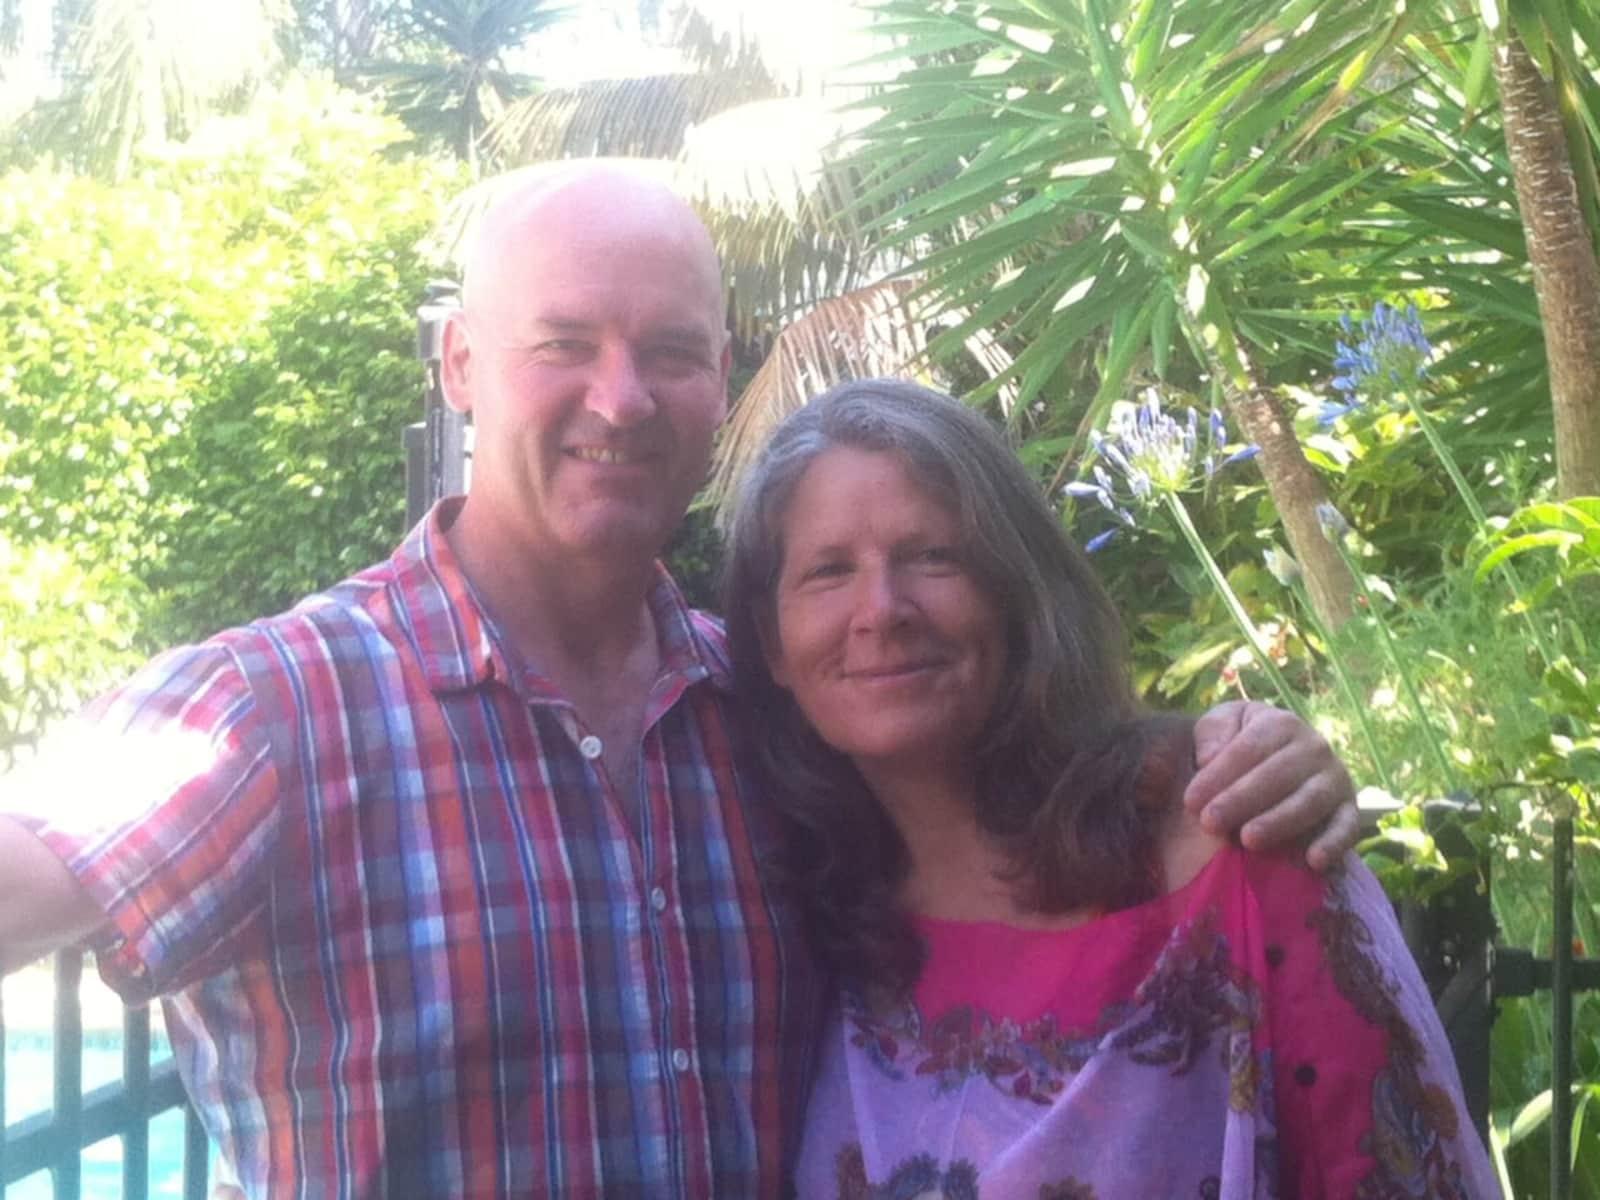 Darren & donna & Donna from Kaitaia, New Zealand